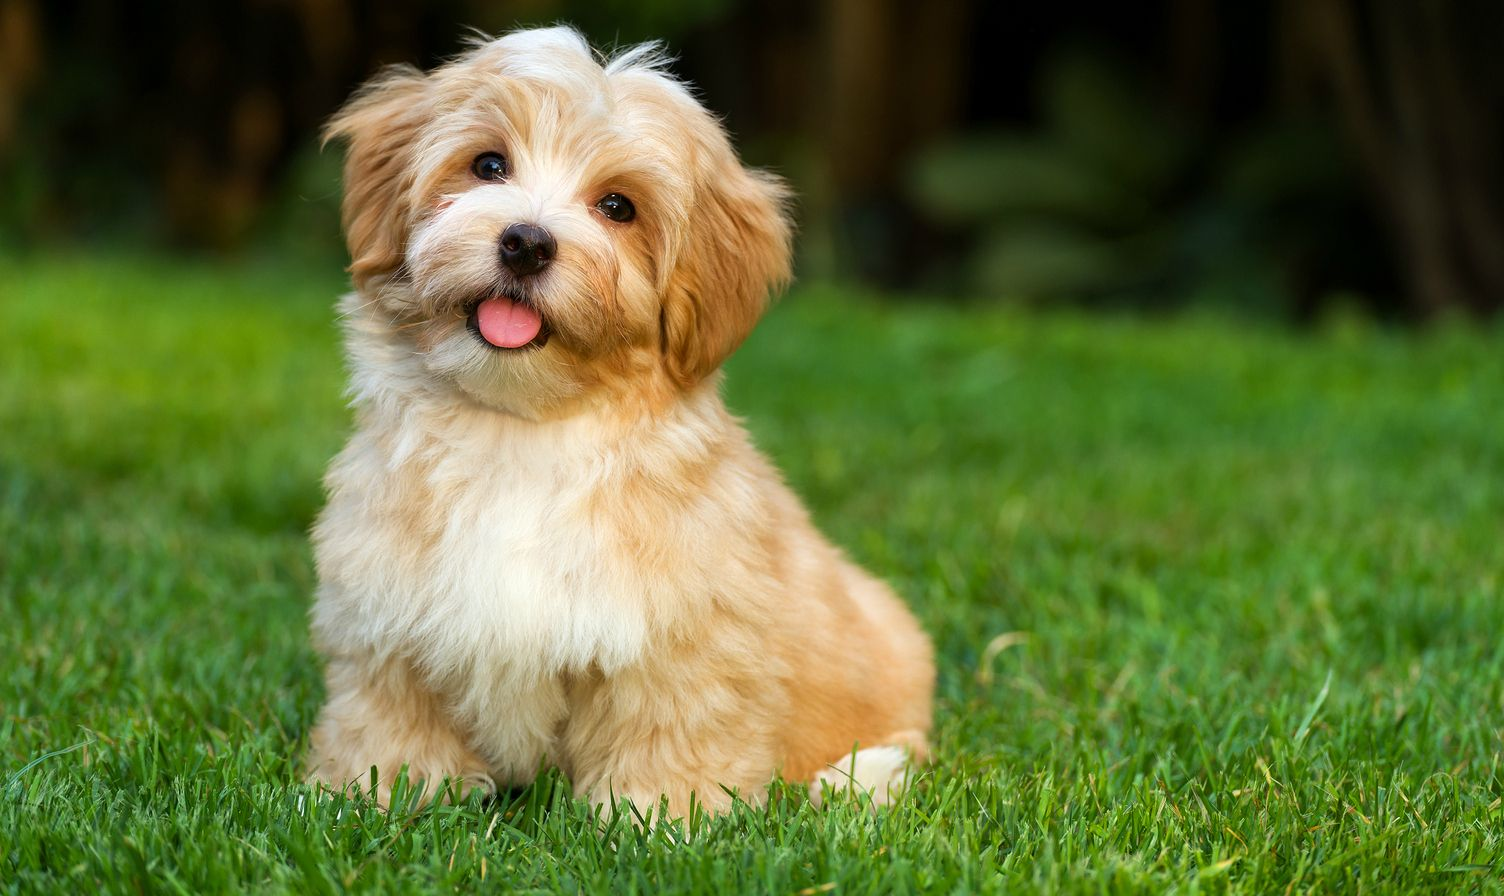 Ct Breeder On Ct Breeder Havanese Puppies Havanese Dogs Dogs